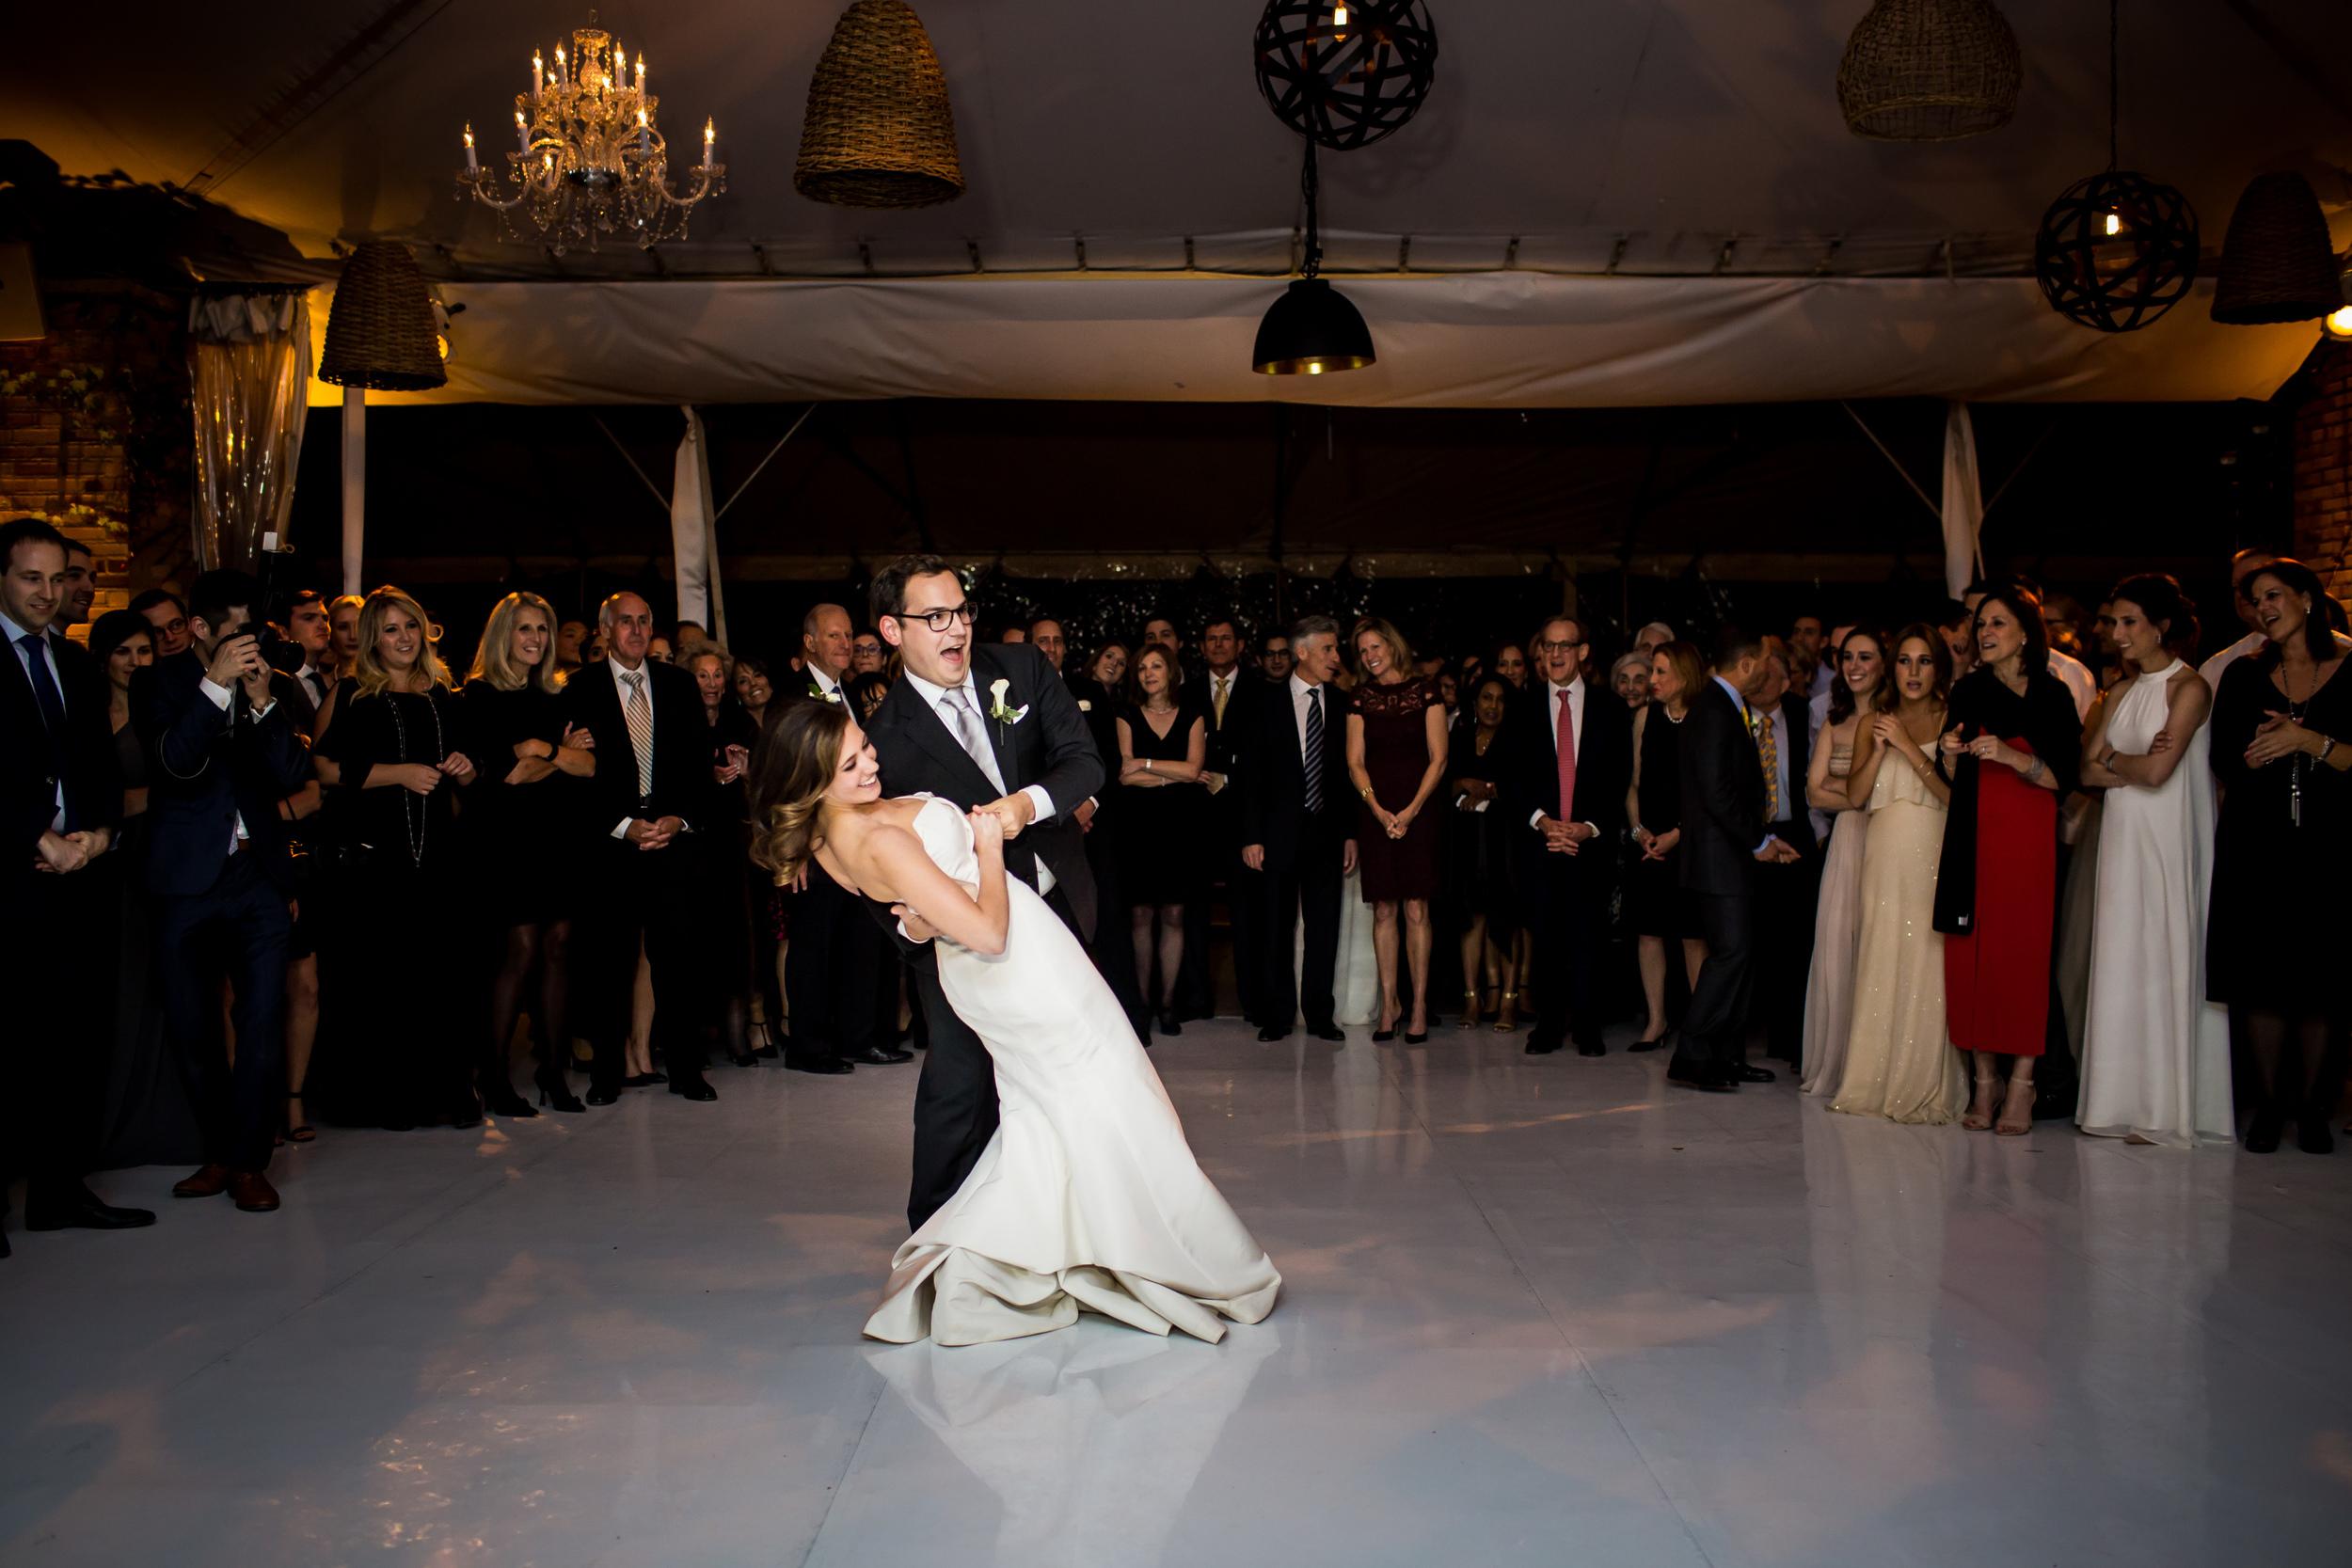 A wedding dance dip done to John Legend at Chicago Botanic Garden